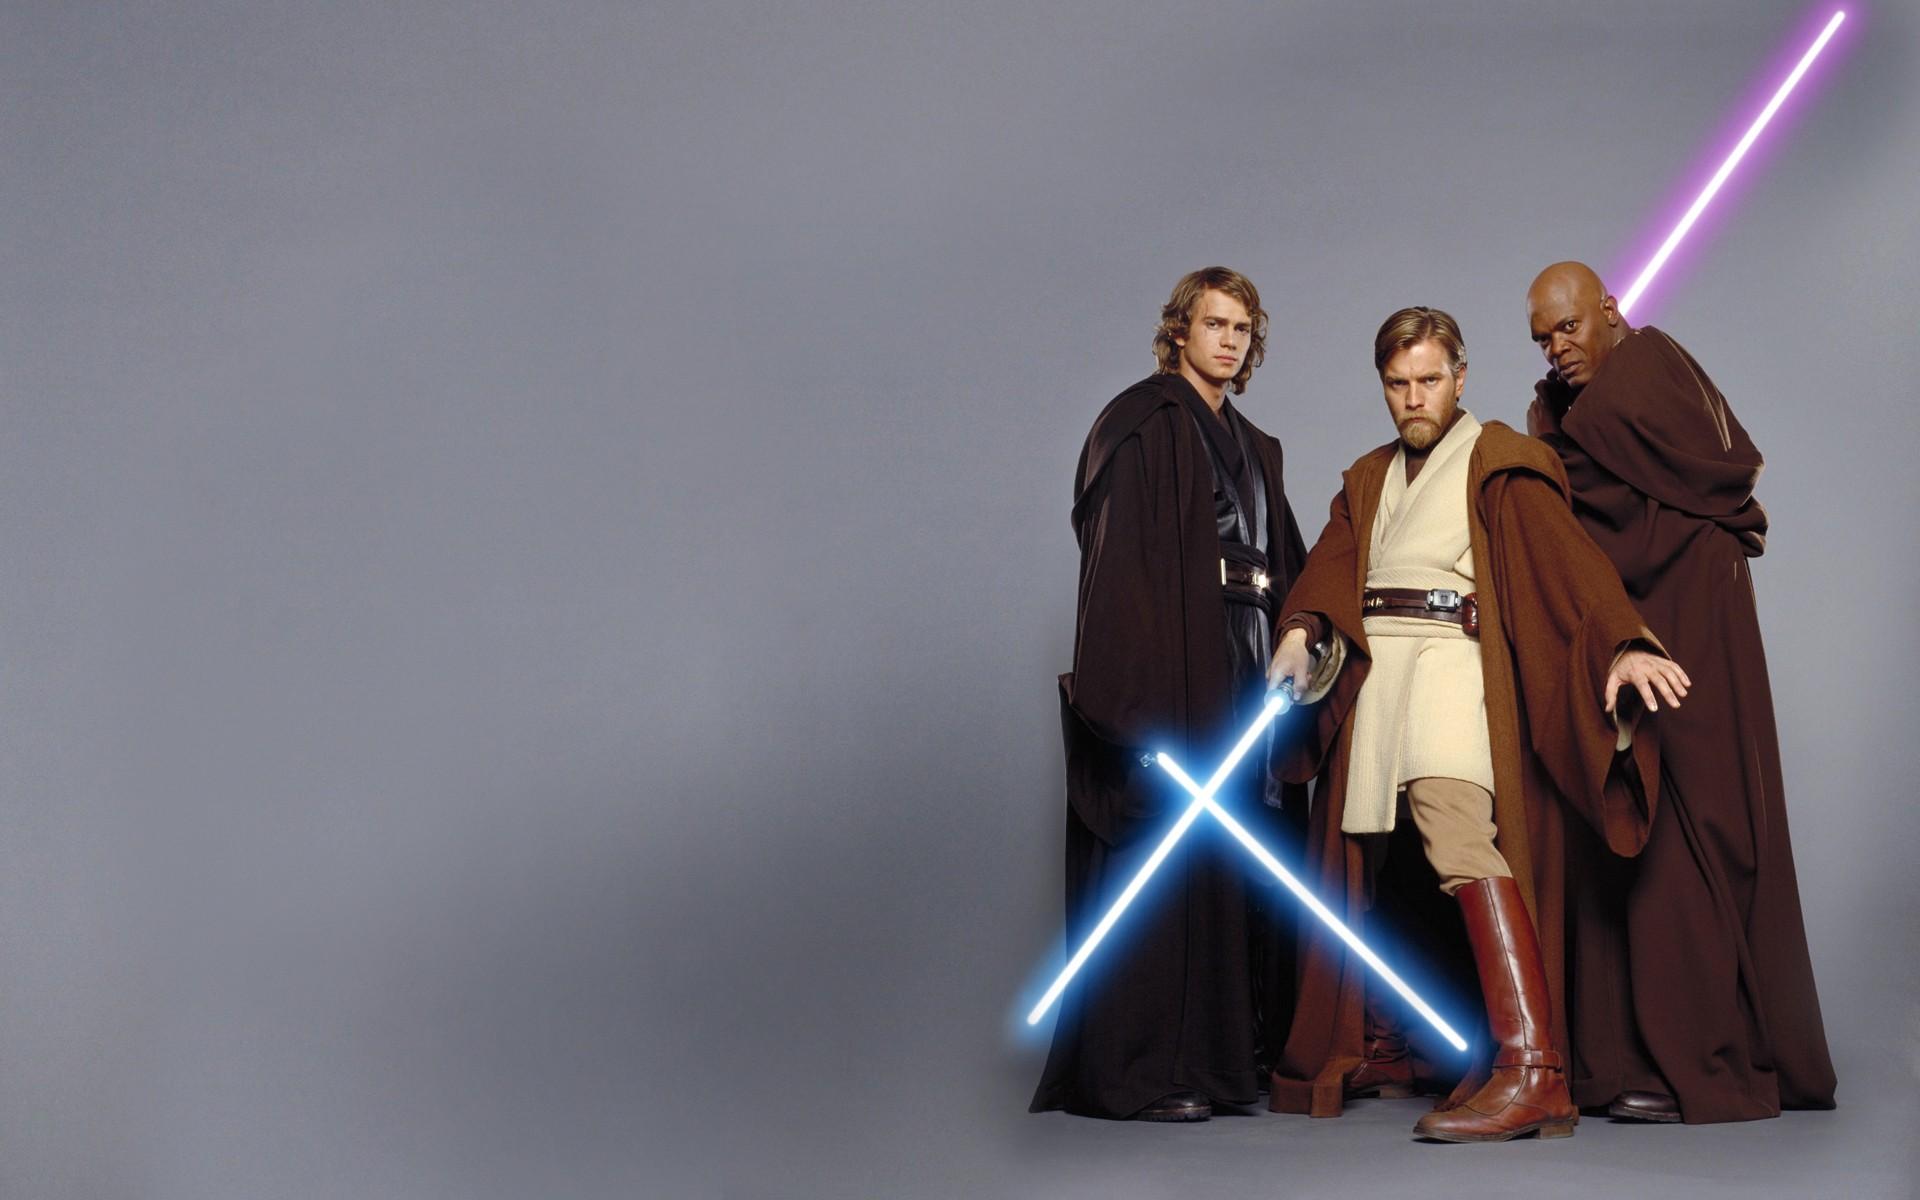 Star Wars Luke Skywalker Darth Vader Anakin Skywalker HD